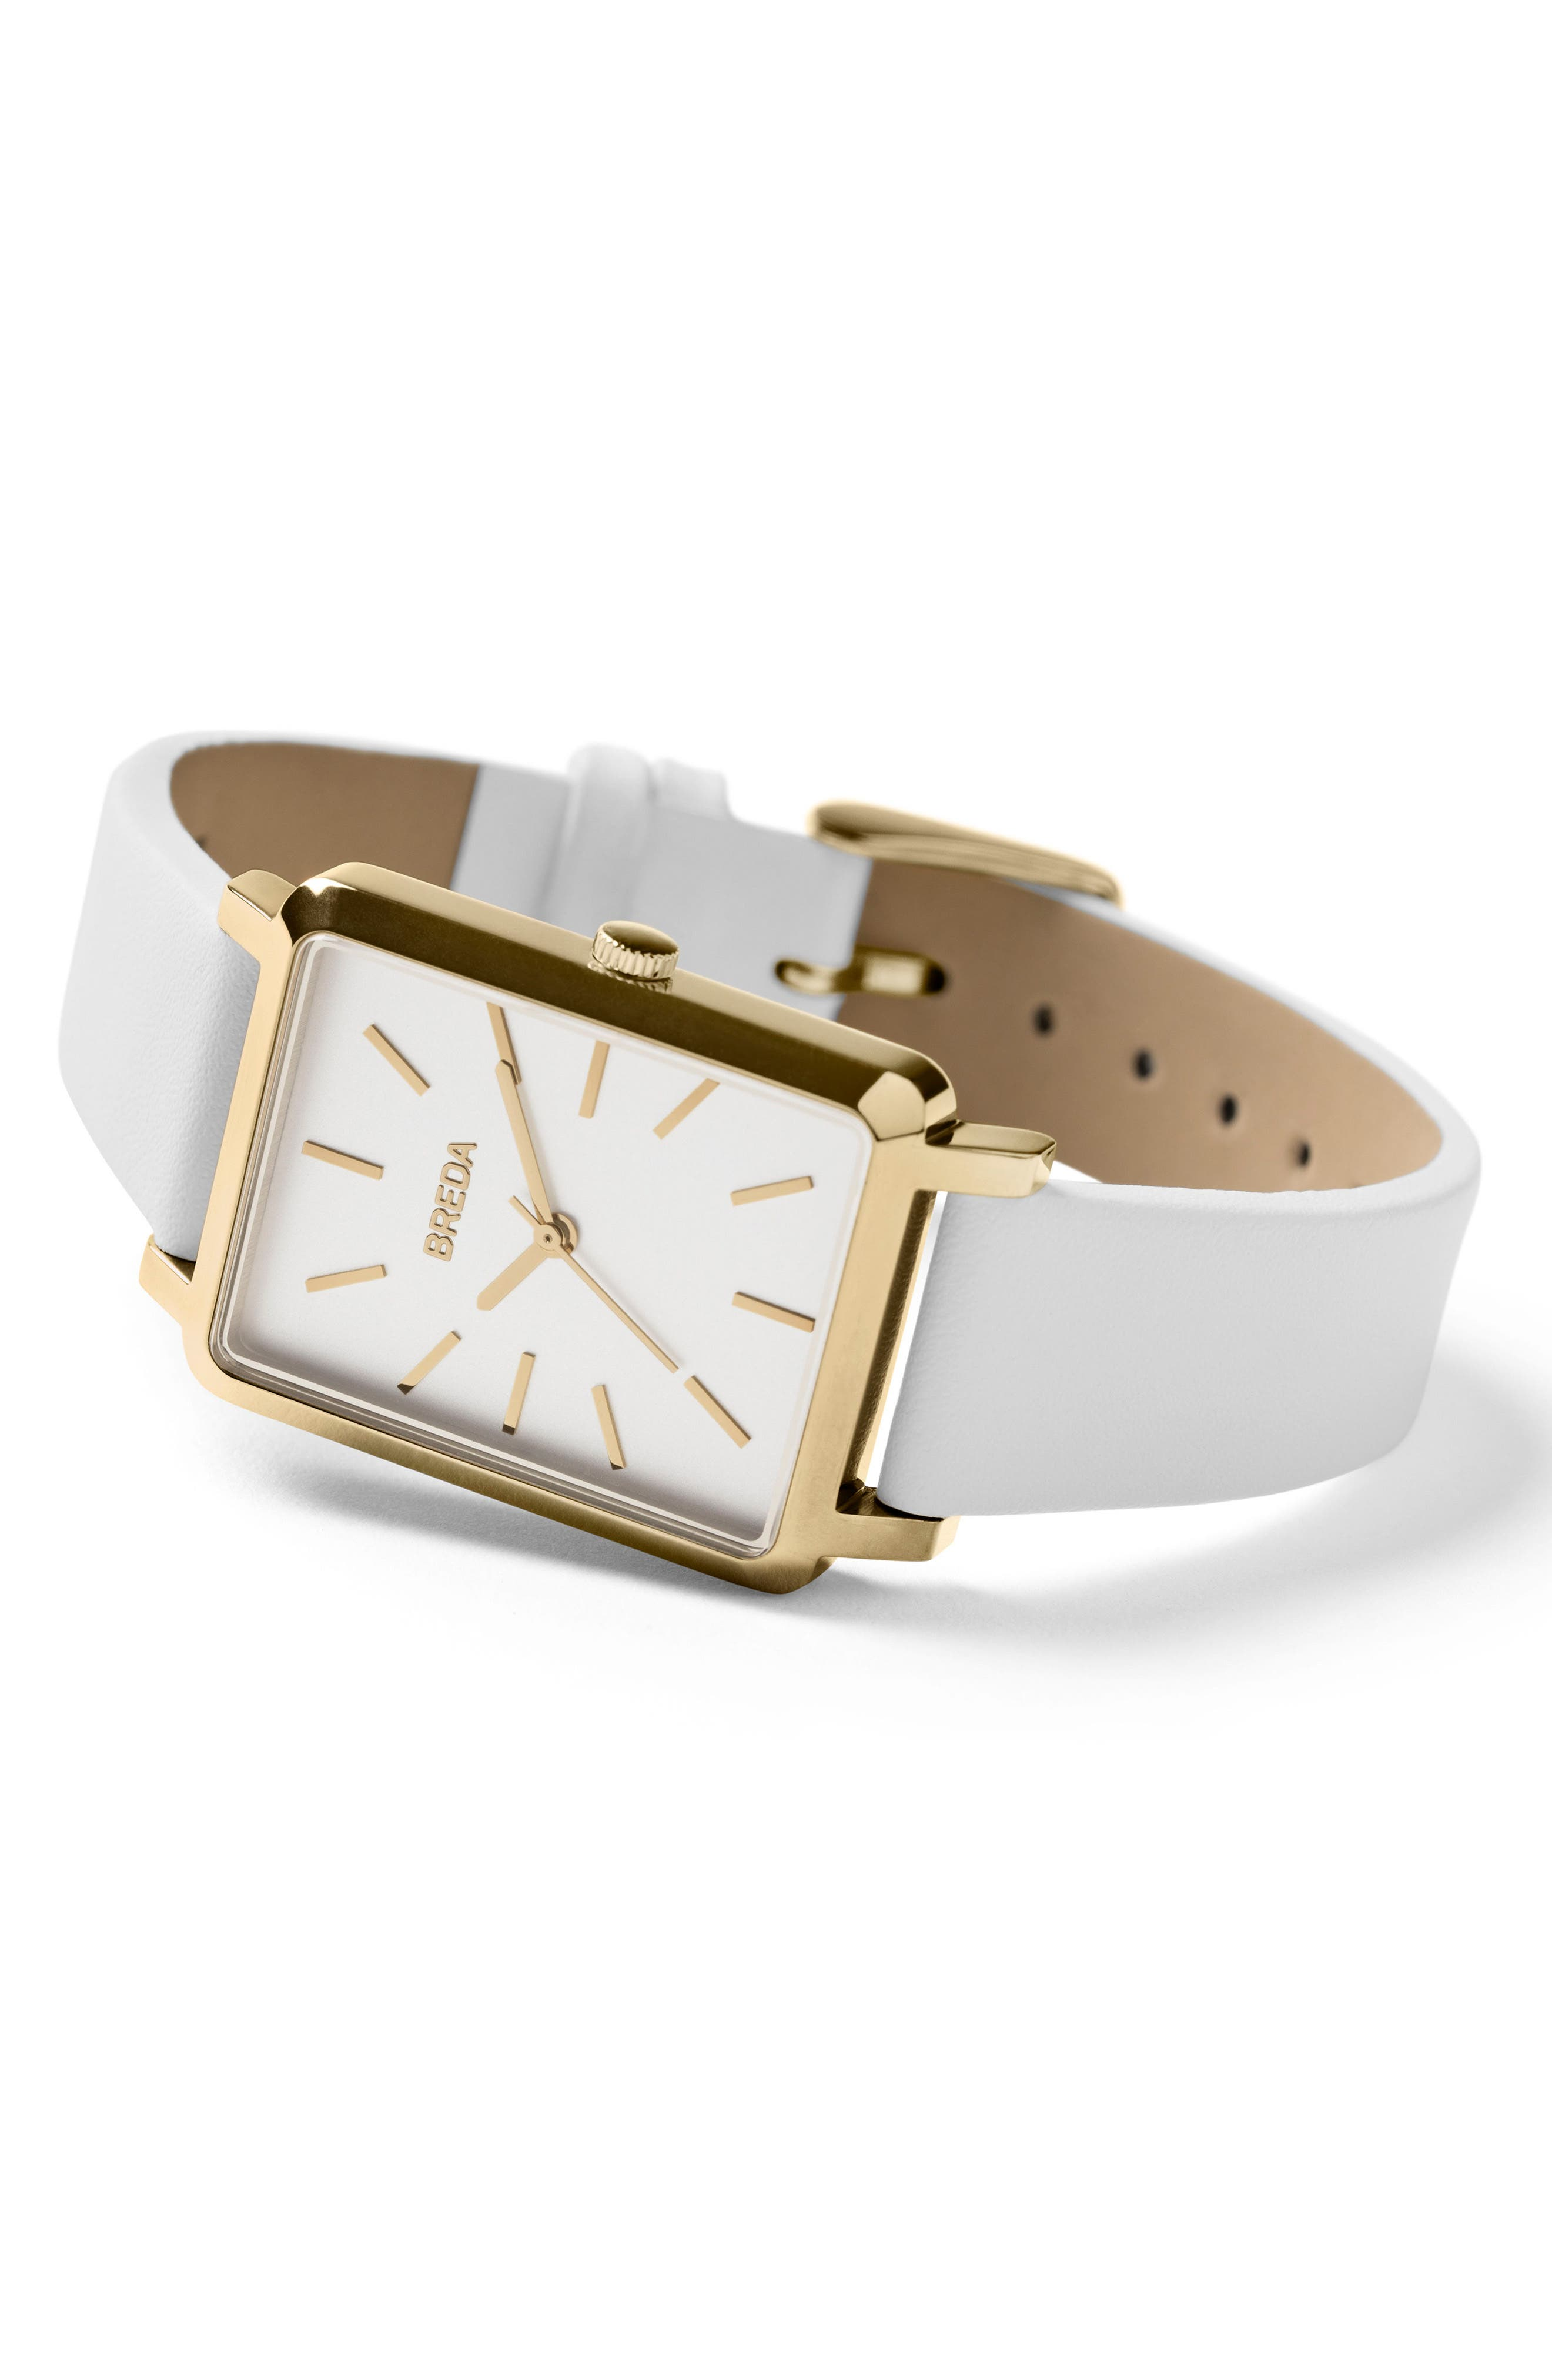 Baer Rectangular Leather Strap Watch, 26mm,                             Alternate thumbnail 7, color,